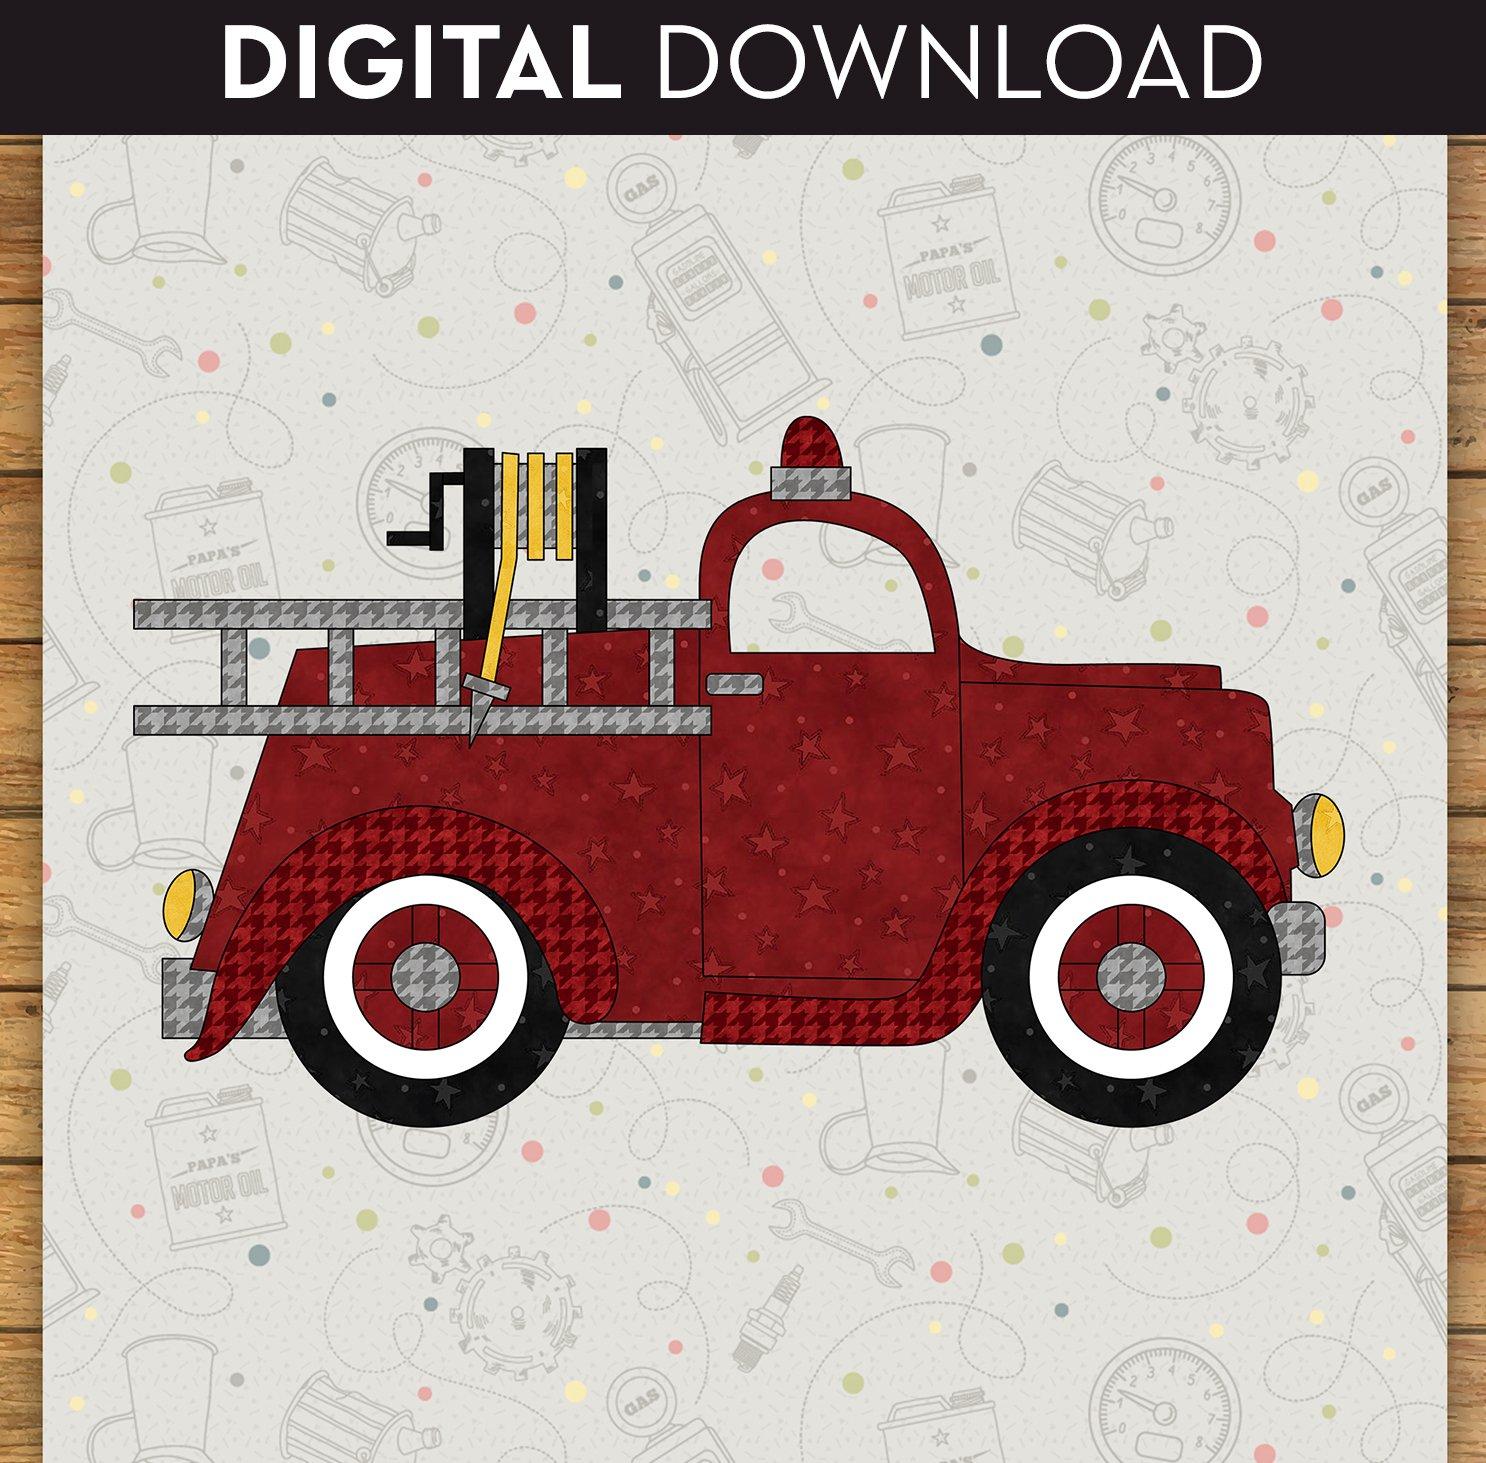 Fire Truck - Download